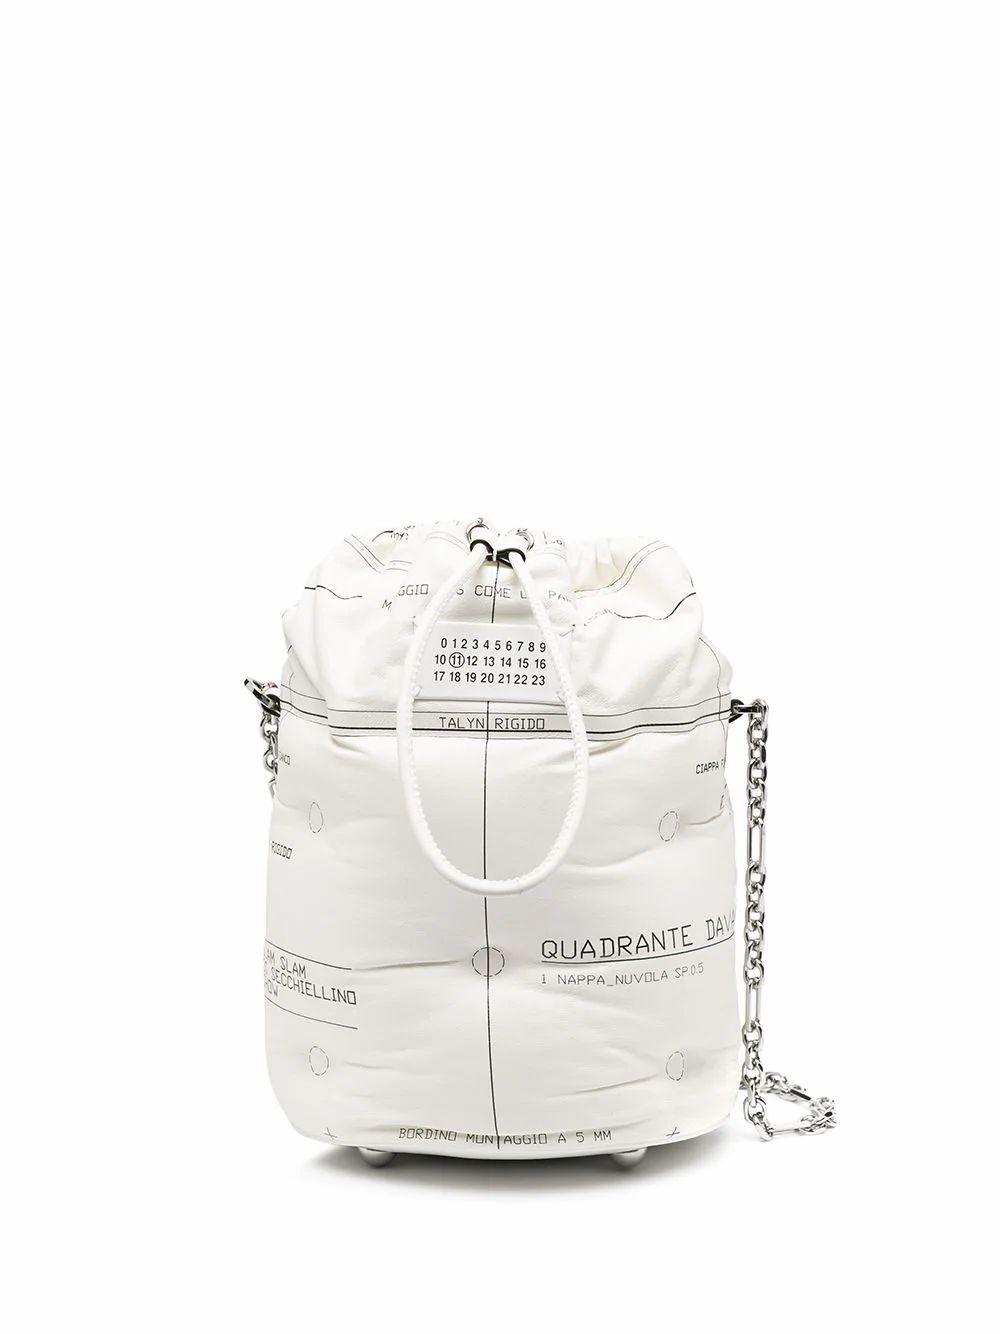 Maison Margiela MAISON MARGIELA WOMEN'S WHITE LEATHER SHOULDER BAG